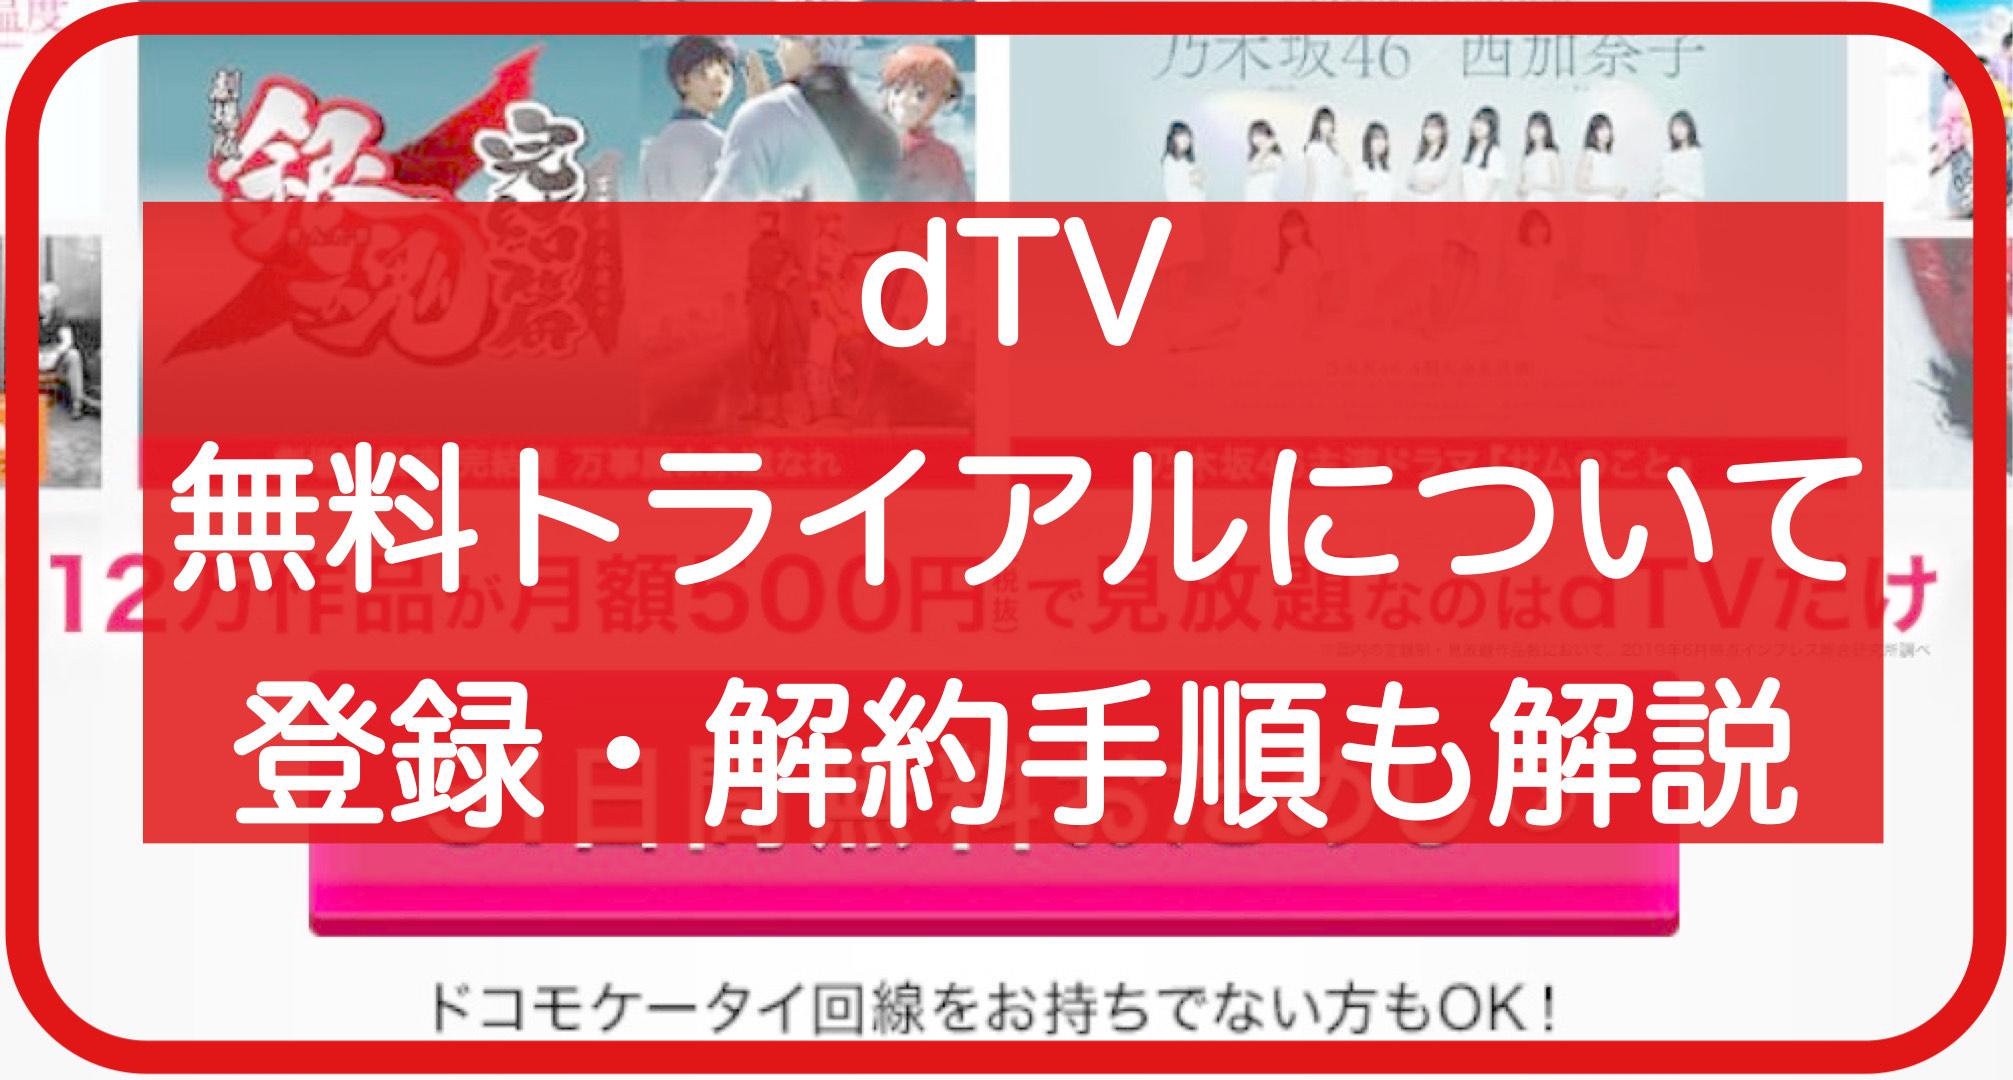 dTVの無料トライアルを解説|登録・解約の手順も